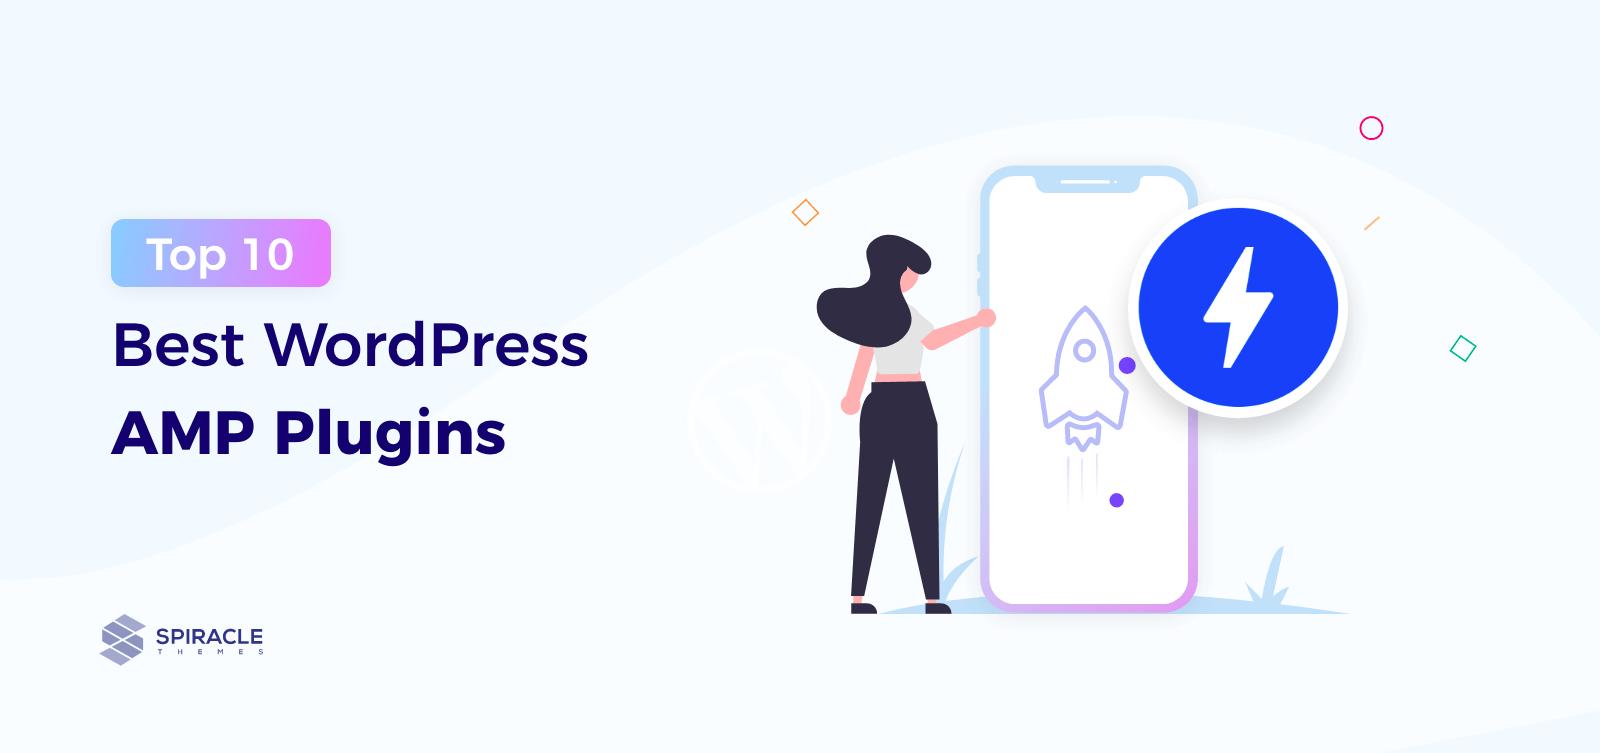 Top 10 Best WordPress AMP Plugins